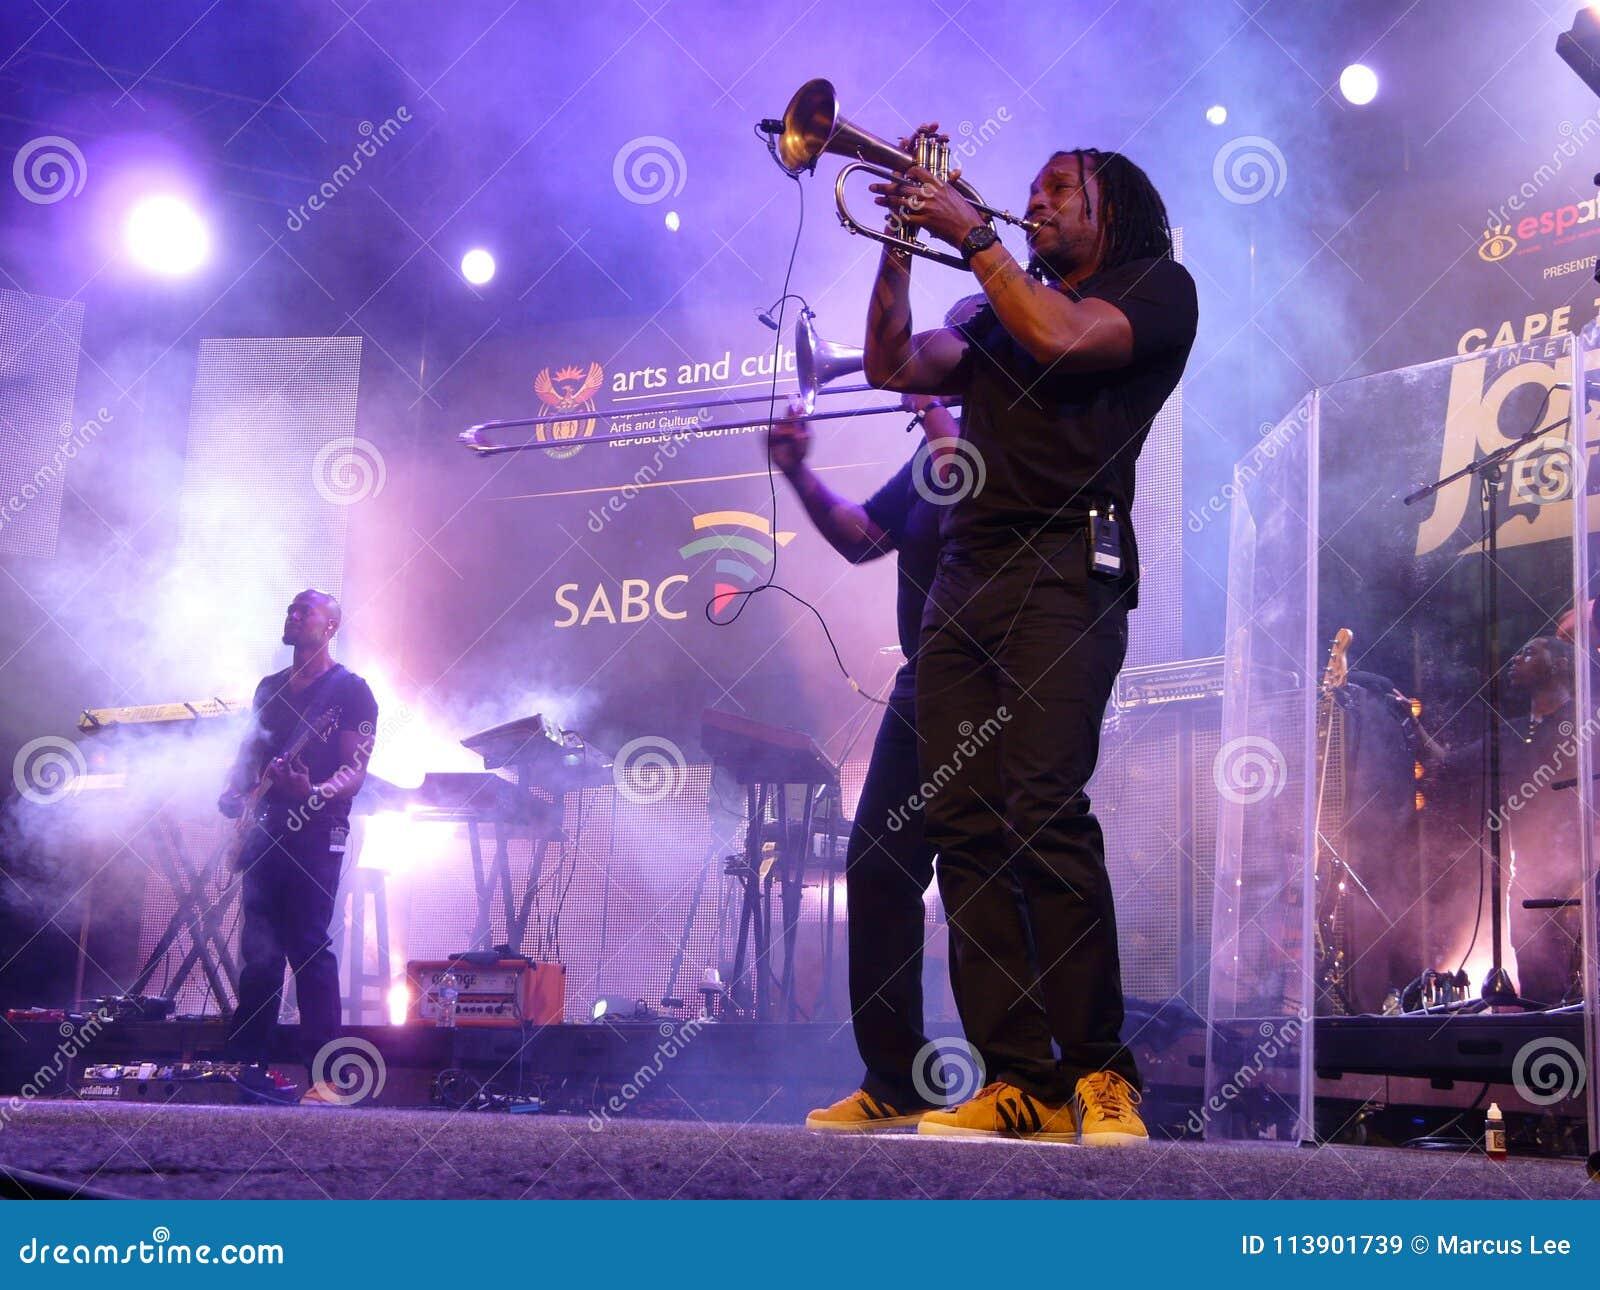 Cape Town-International Jazz Festival